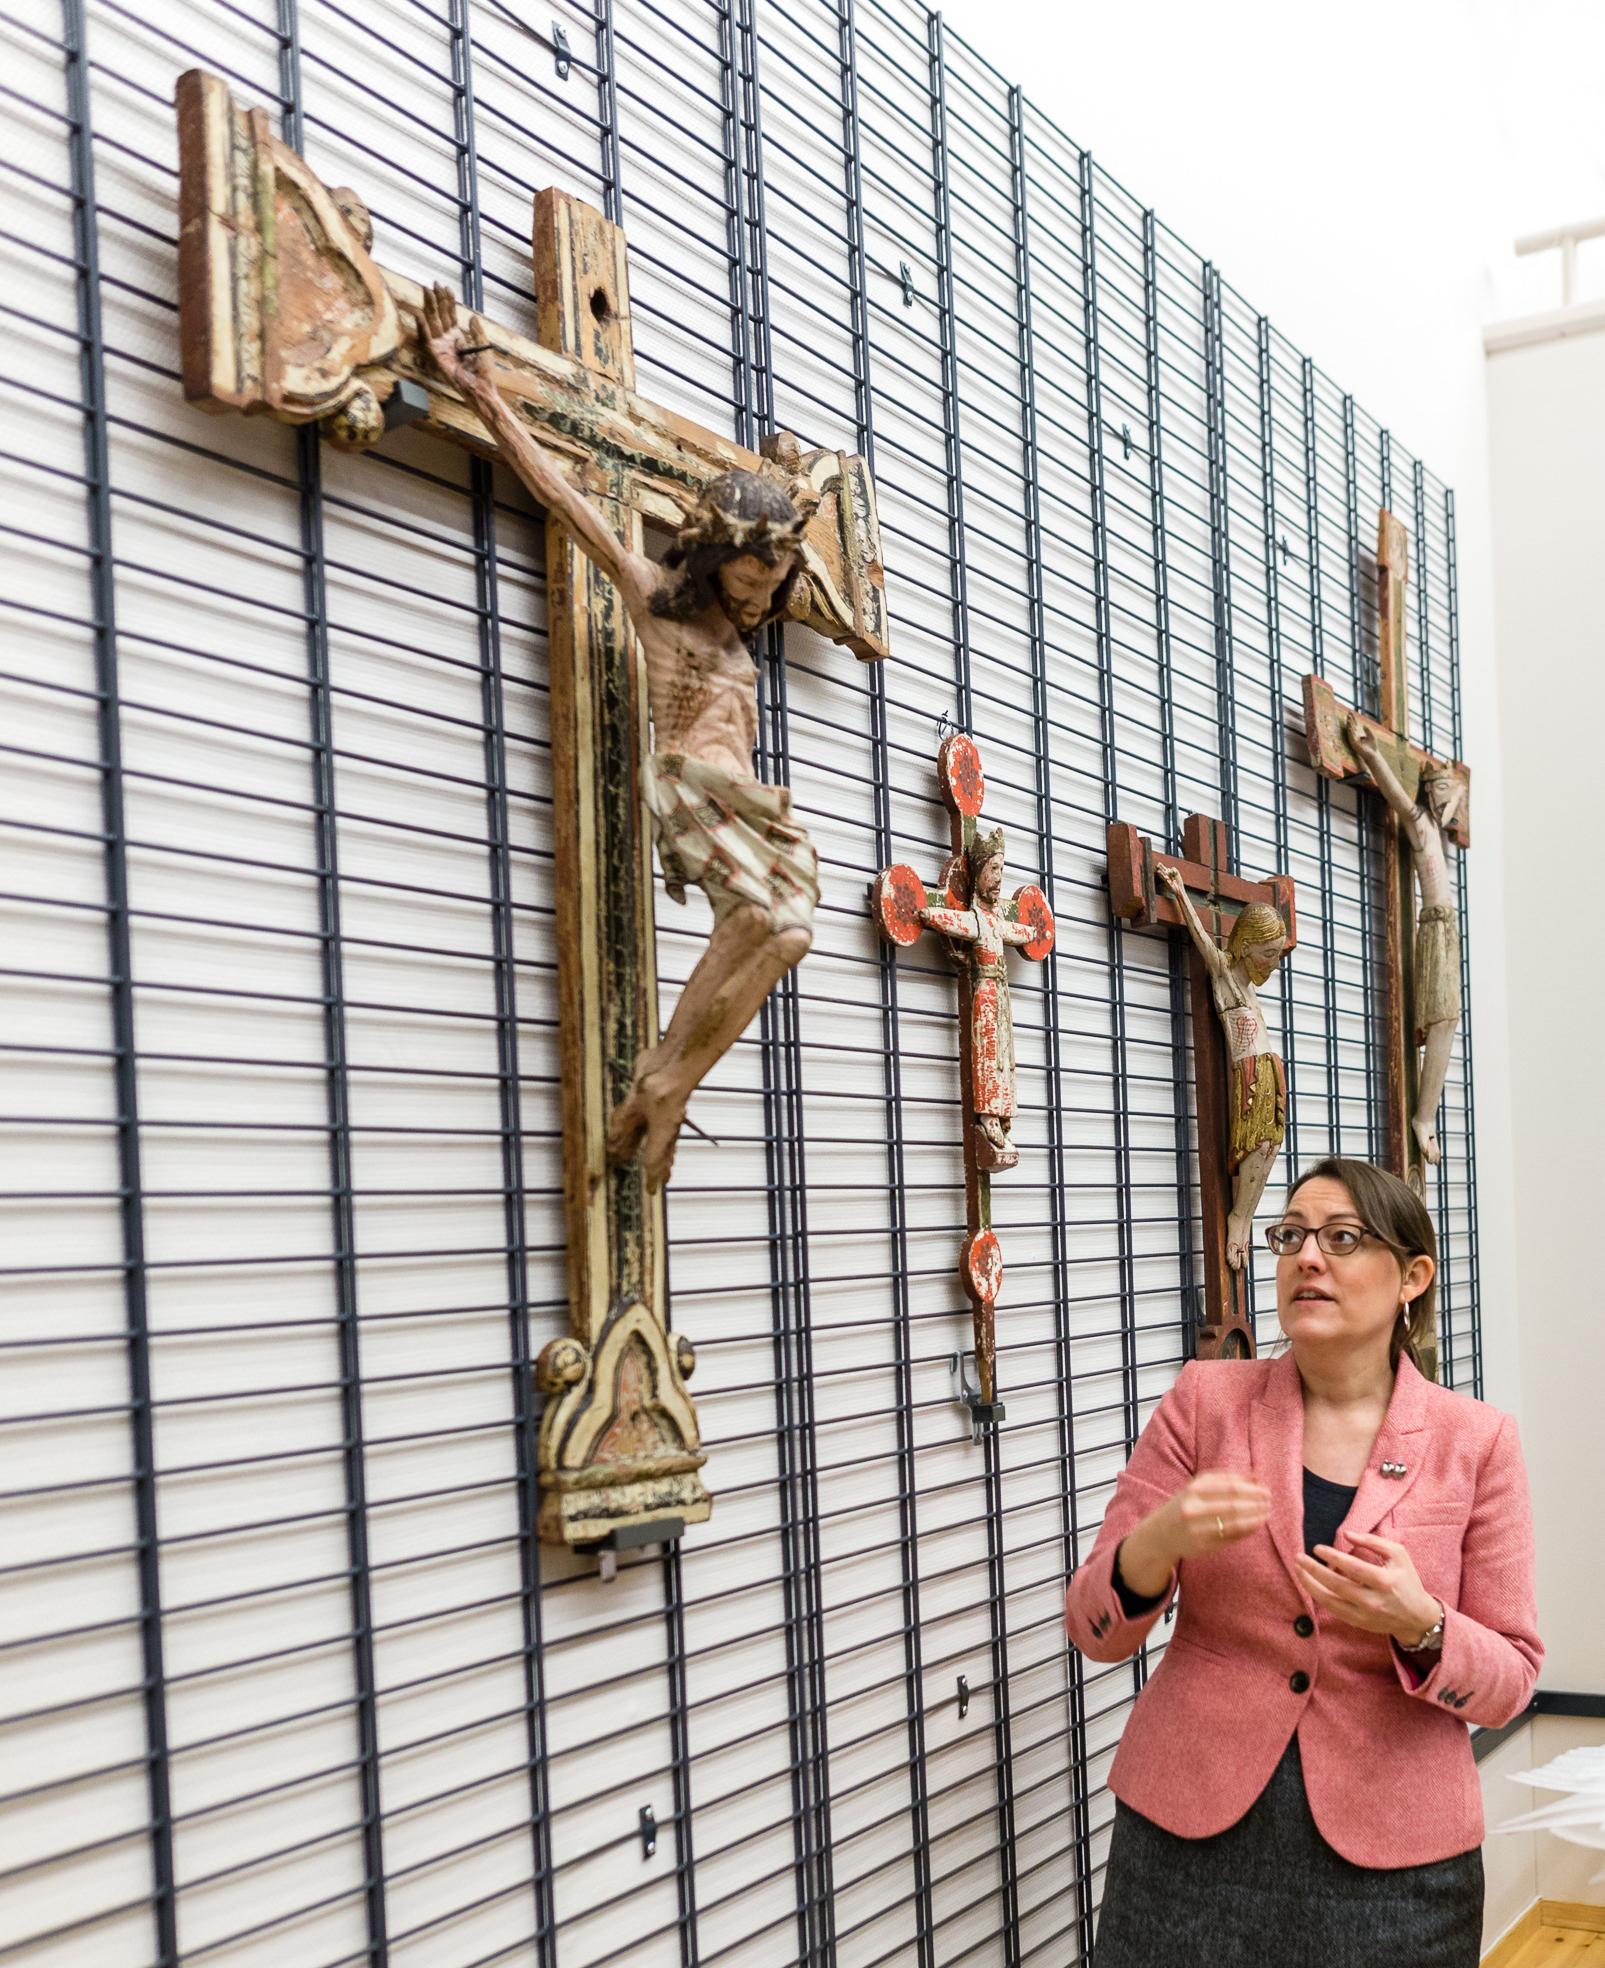 Kunsthistoriker Margrethe C. Stang er glad for at kirkekunstsamlingen nå har kommet fram i lyset. Foto: Julie Gloppe Solem/NTNU